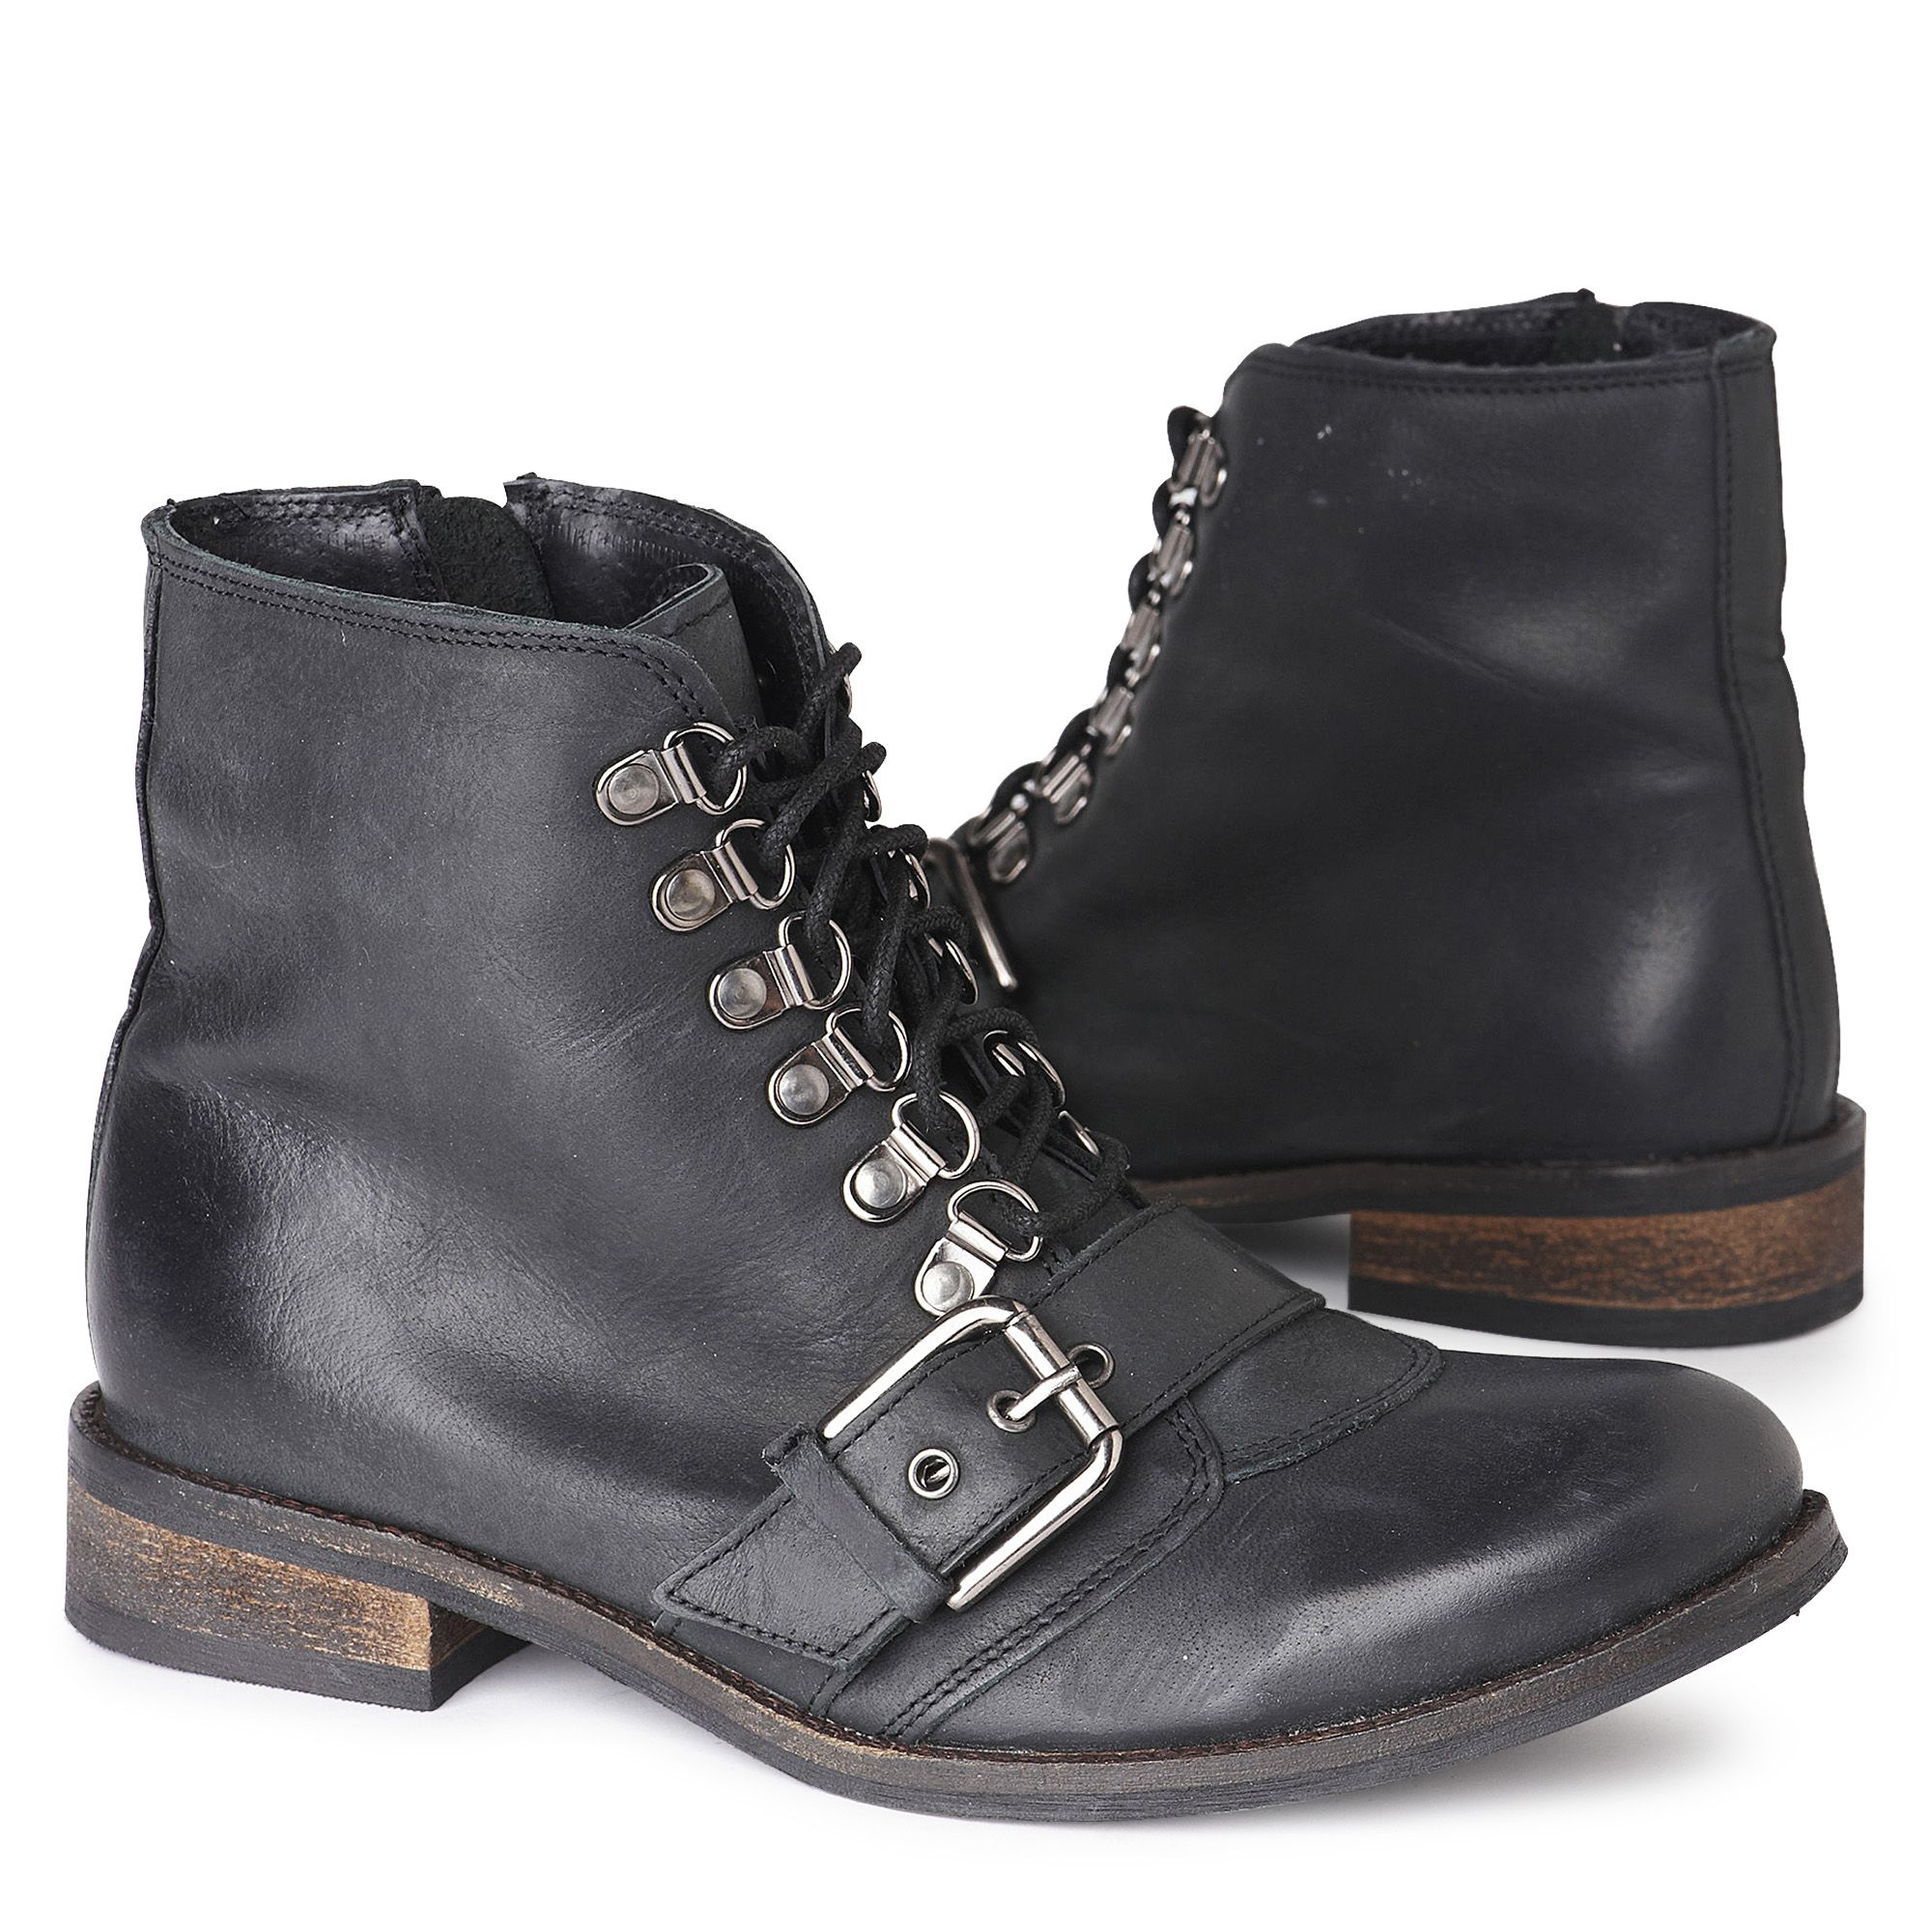 Carvela Kurt Geiger Sidestep Work Boots Black In Black | Lyst